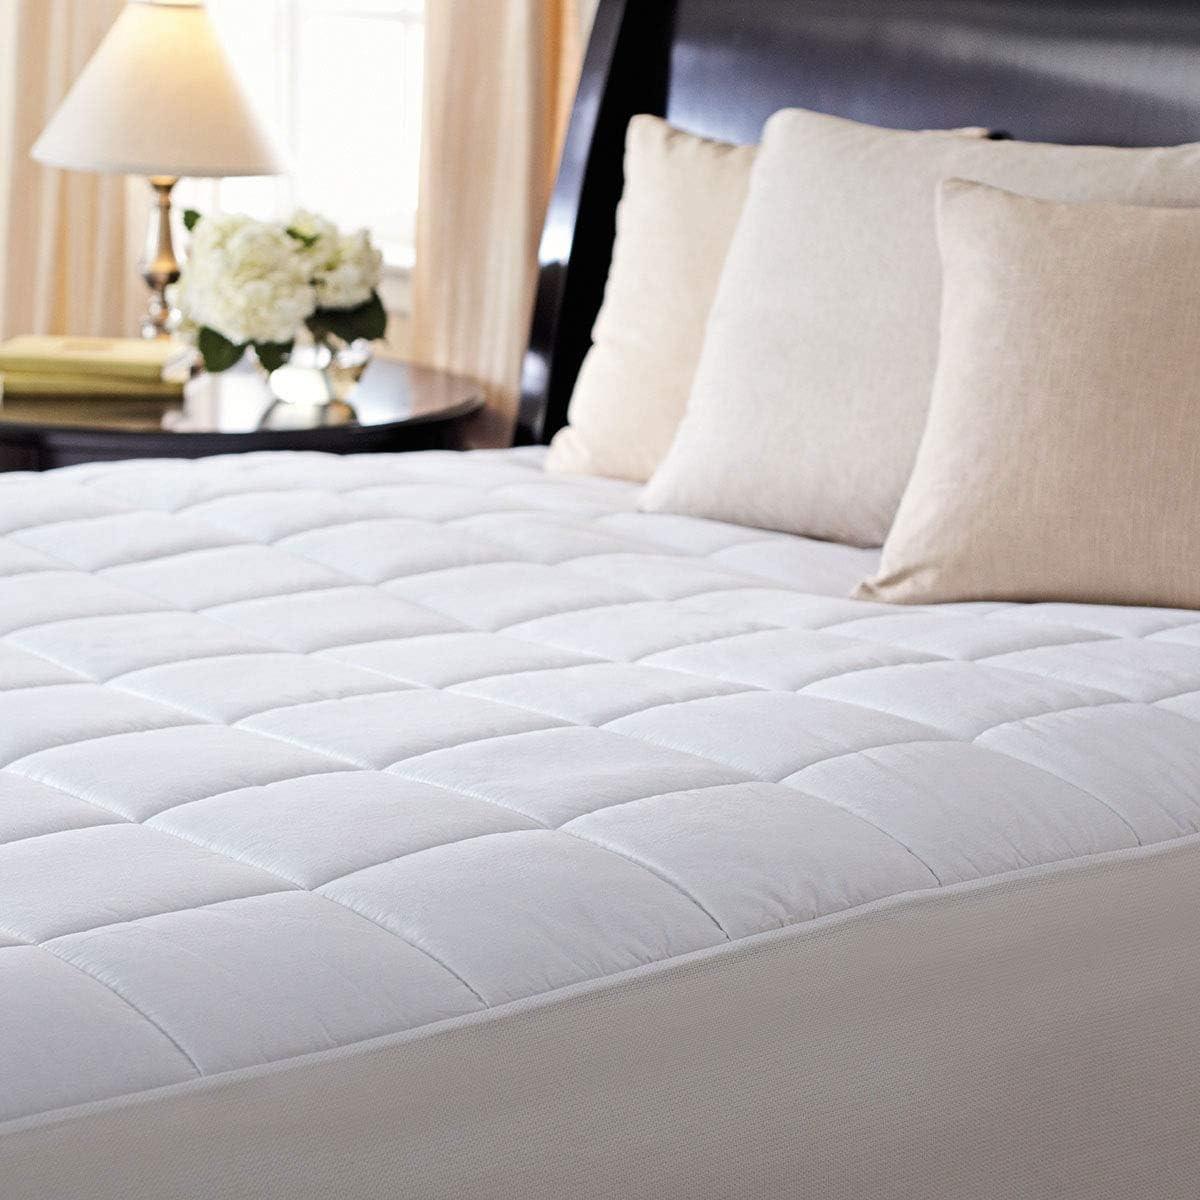 Slumber Rest Premium Electric Mattress Pad - Cal. King